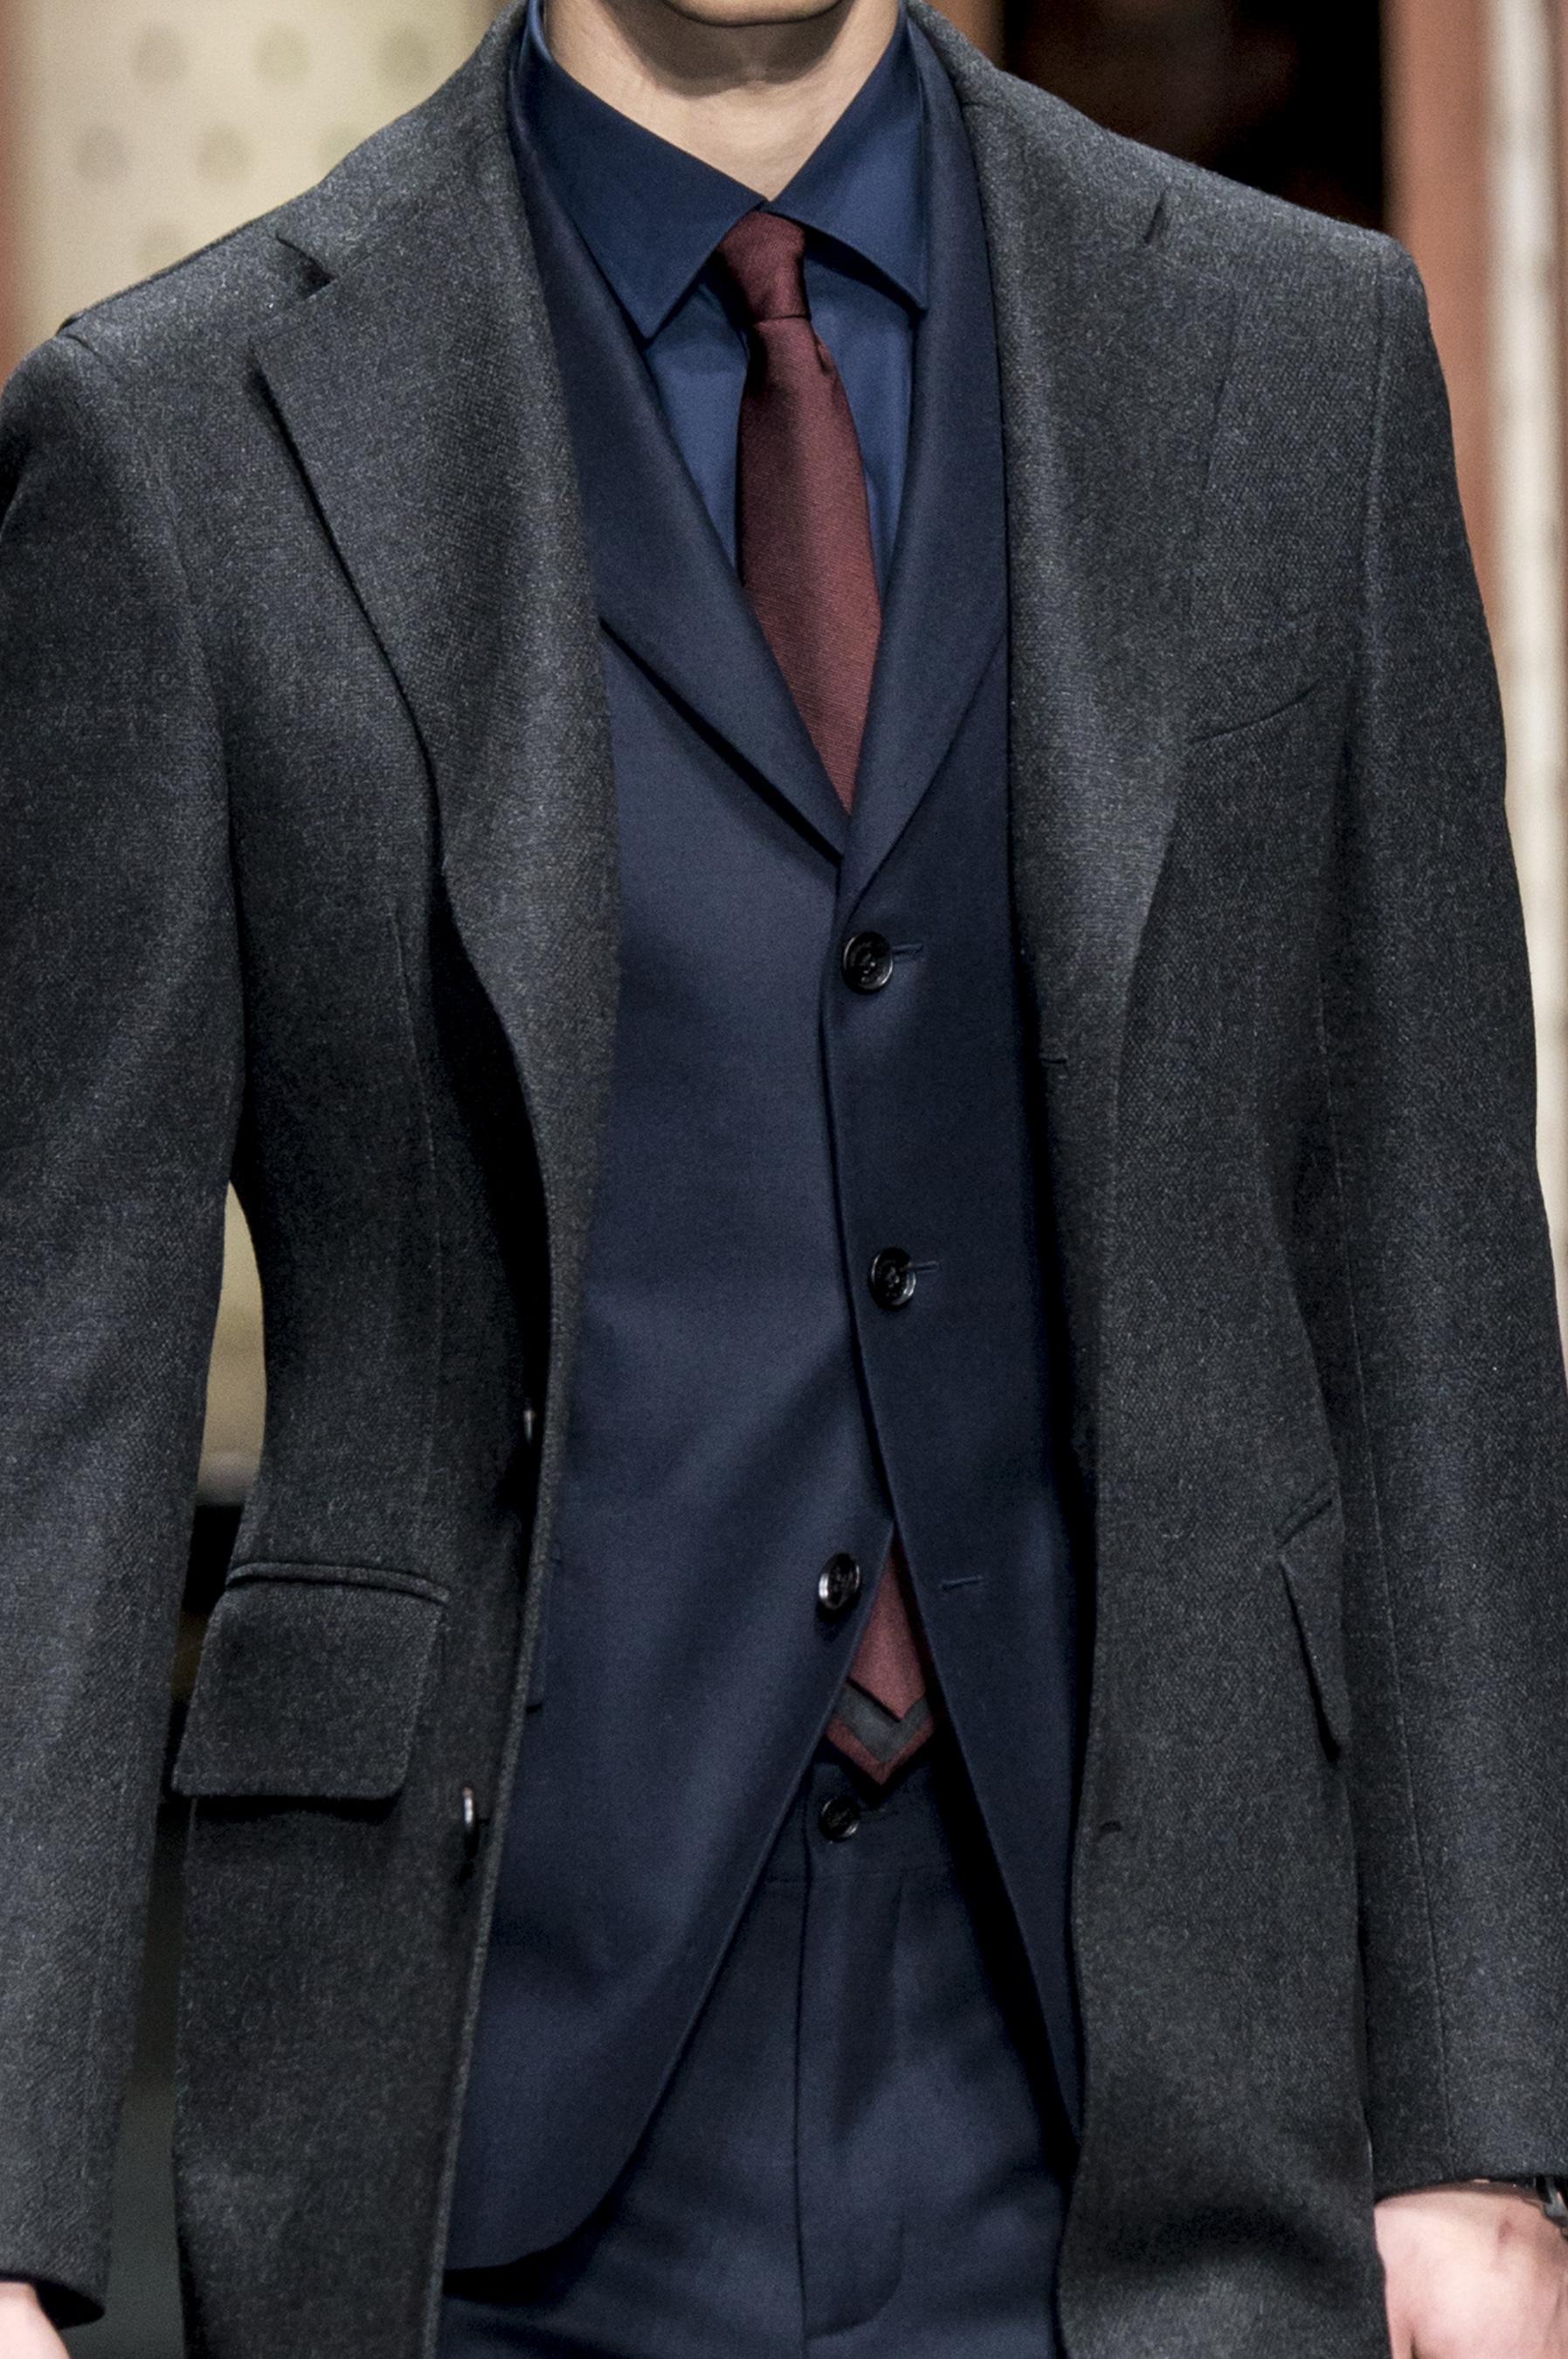 Versace m clp RF17 9562